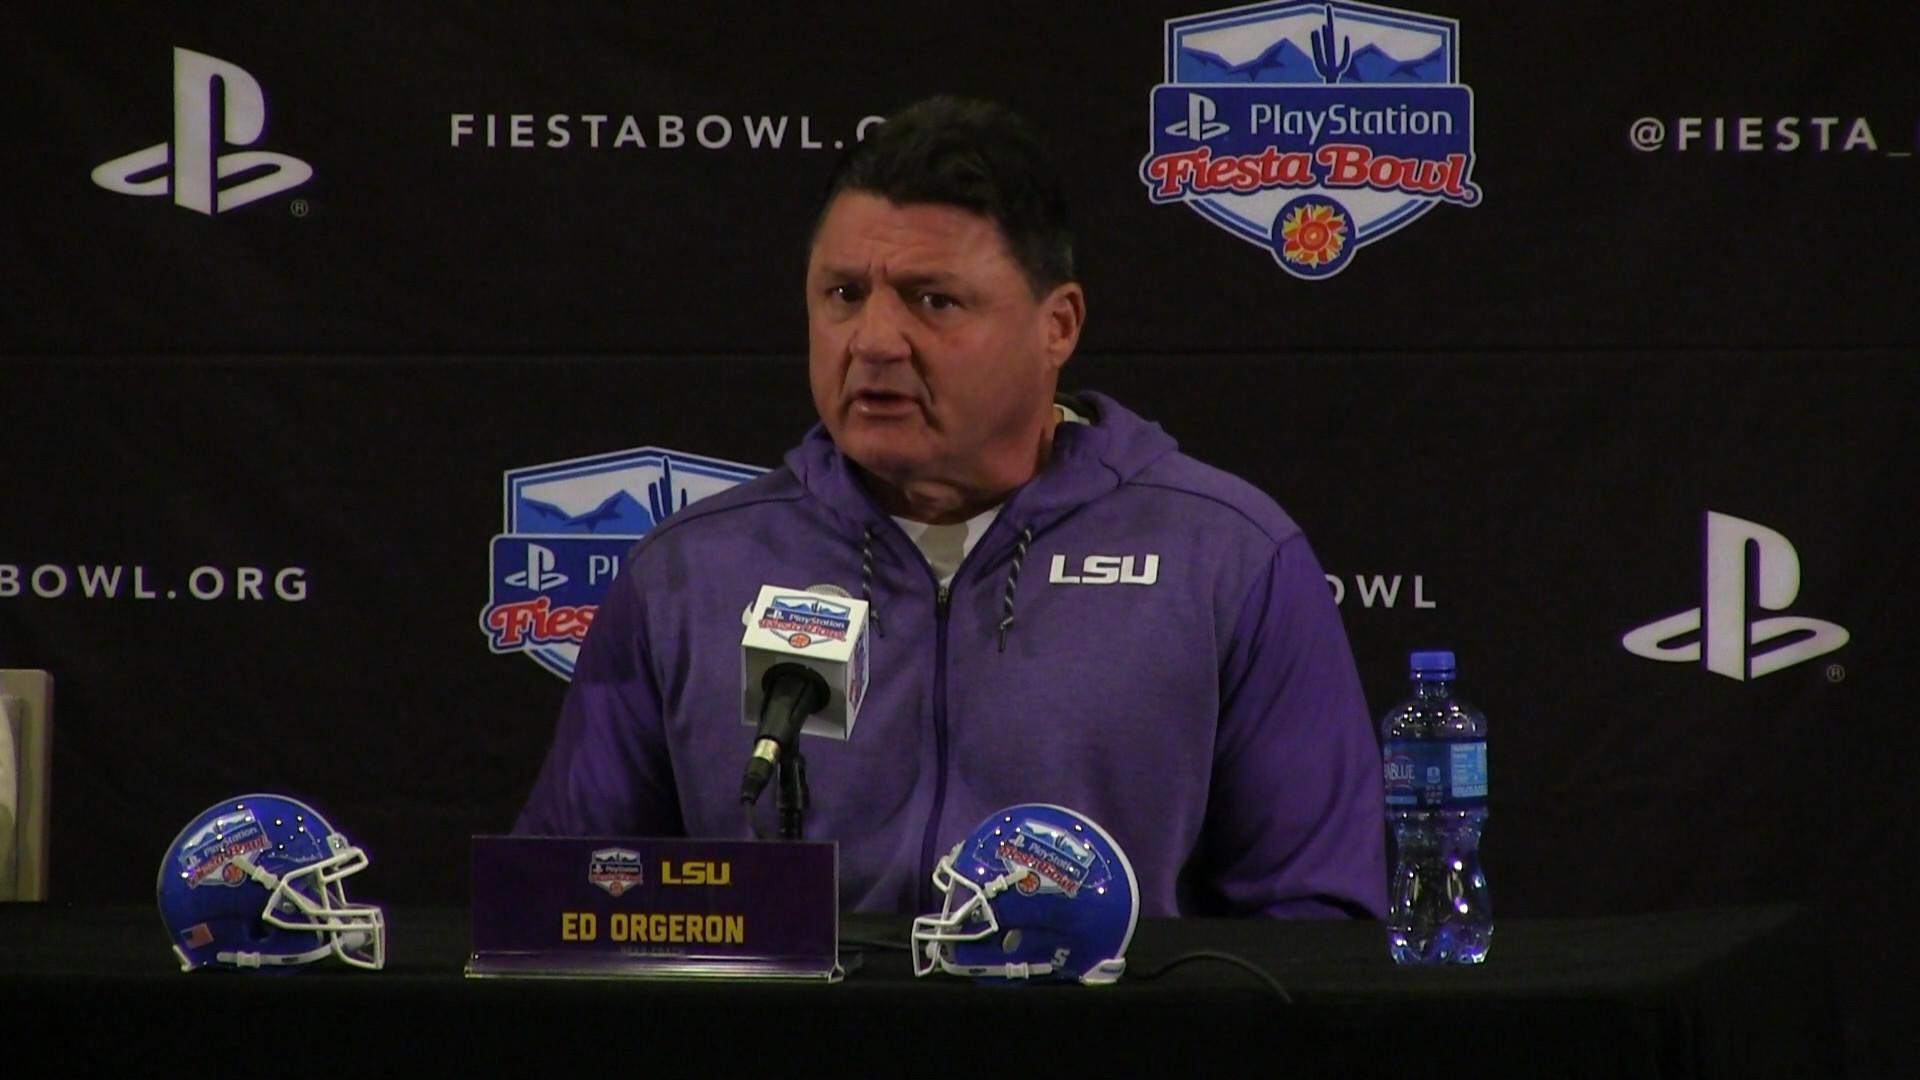 b056f84e1 LSU coach Ed Orgeron passionate about leading Tigers to success for state  of Louisiana - Orlando Sentinel